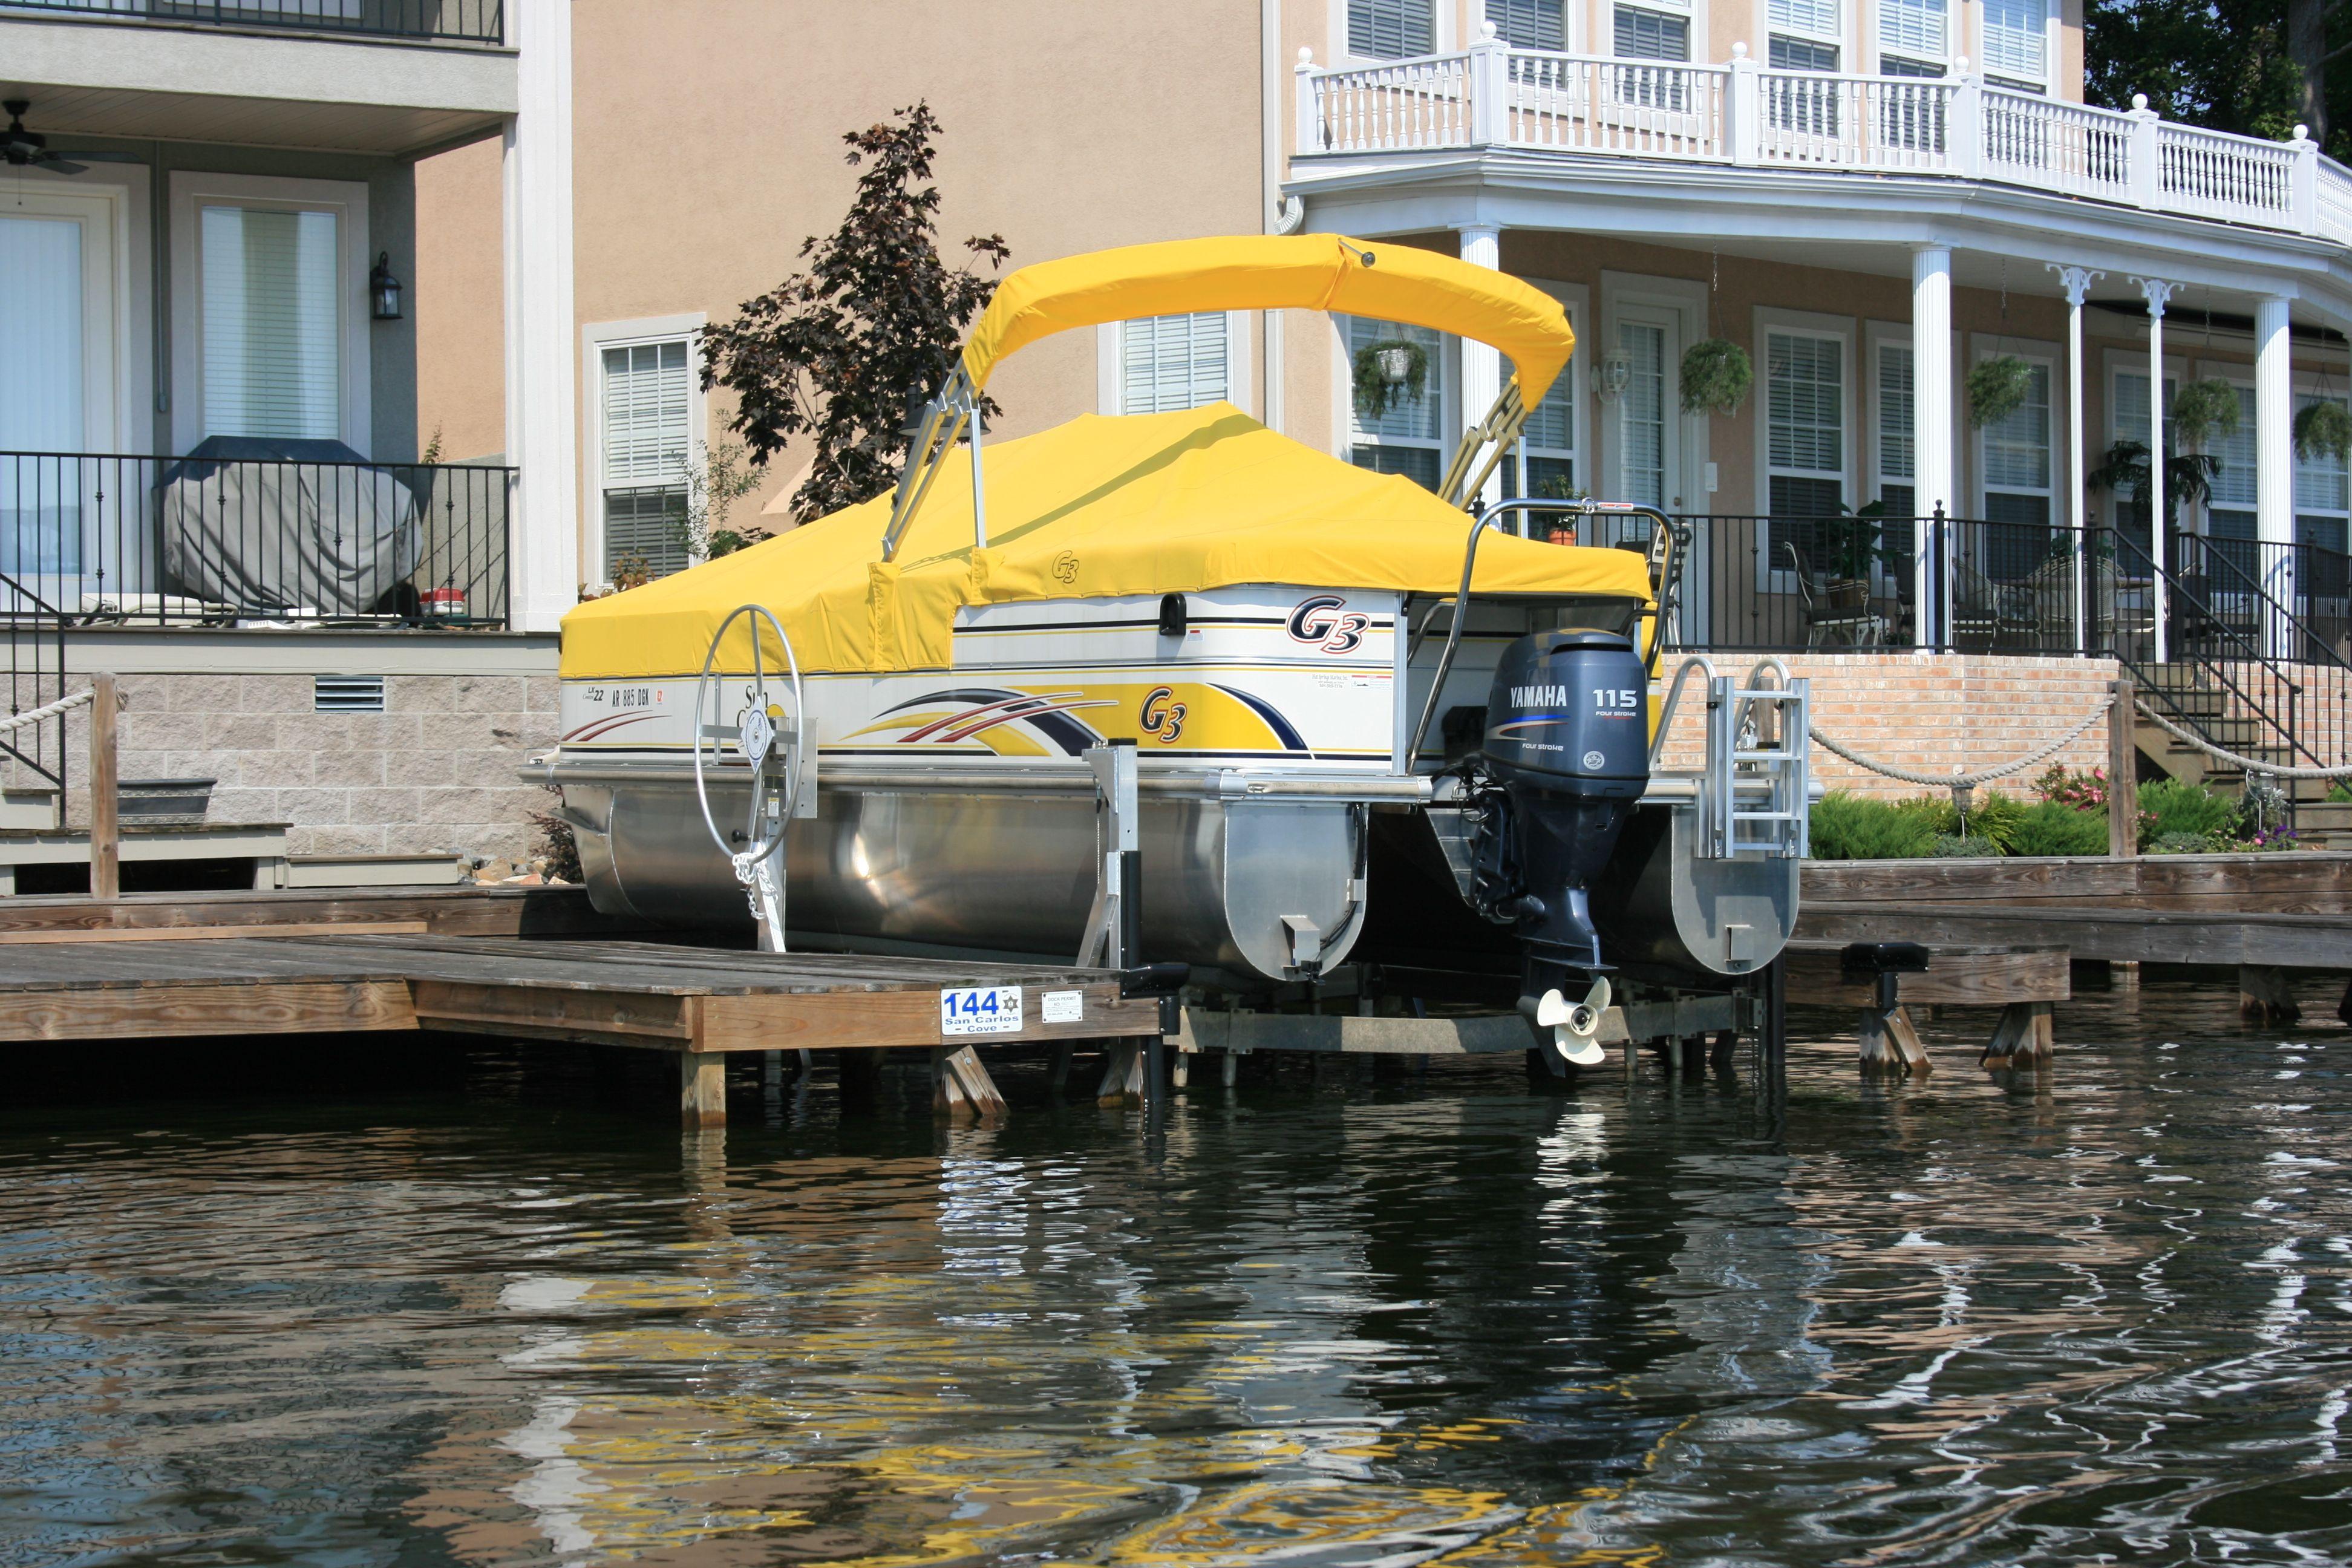 Manual Stand Alone Boat Lift (Williamson Boat Docks Inc.)